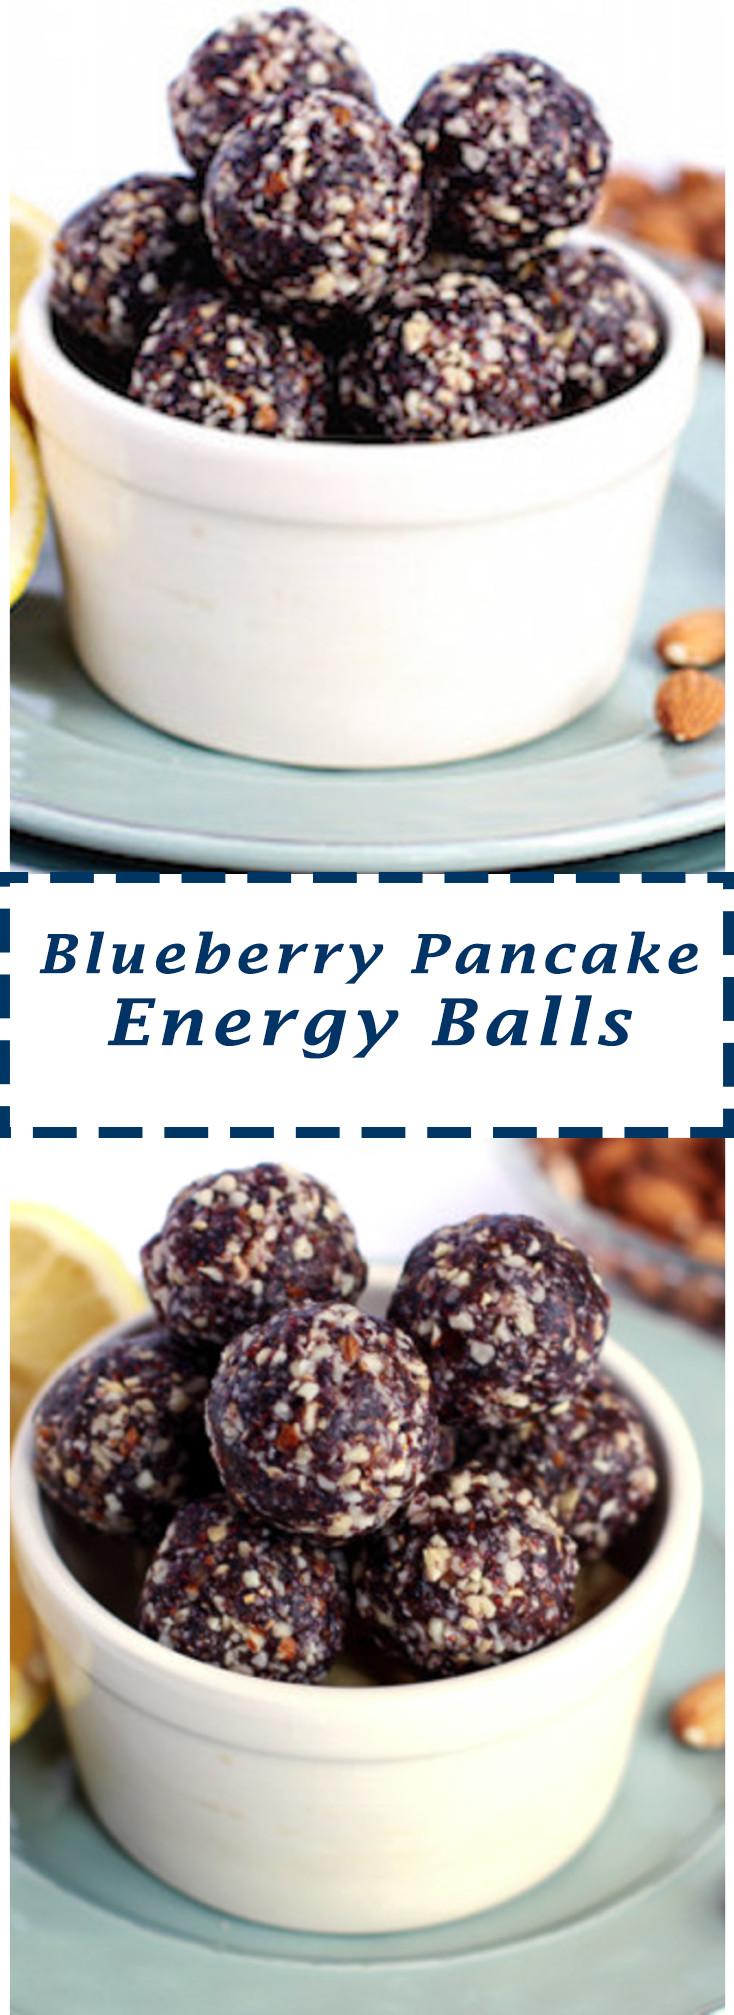 Pinterest Blueberry Pancake Energy Balls